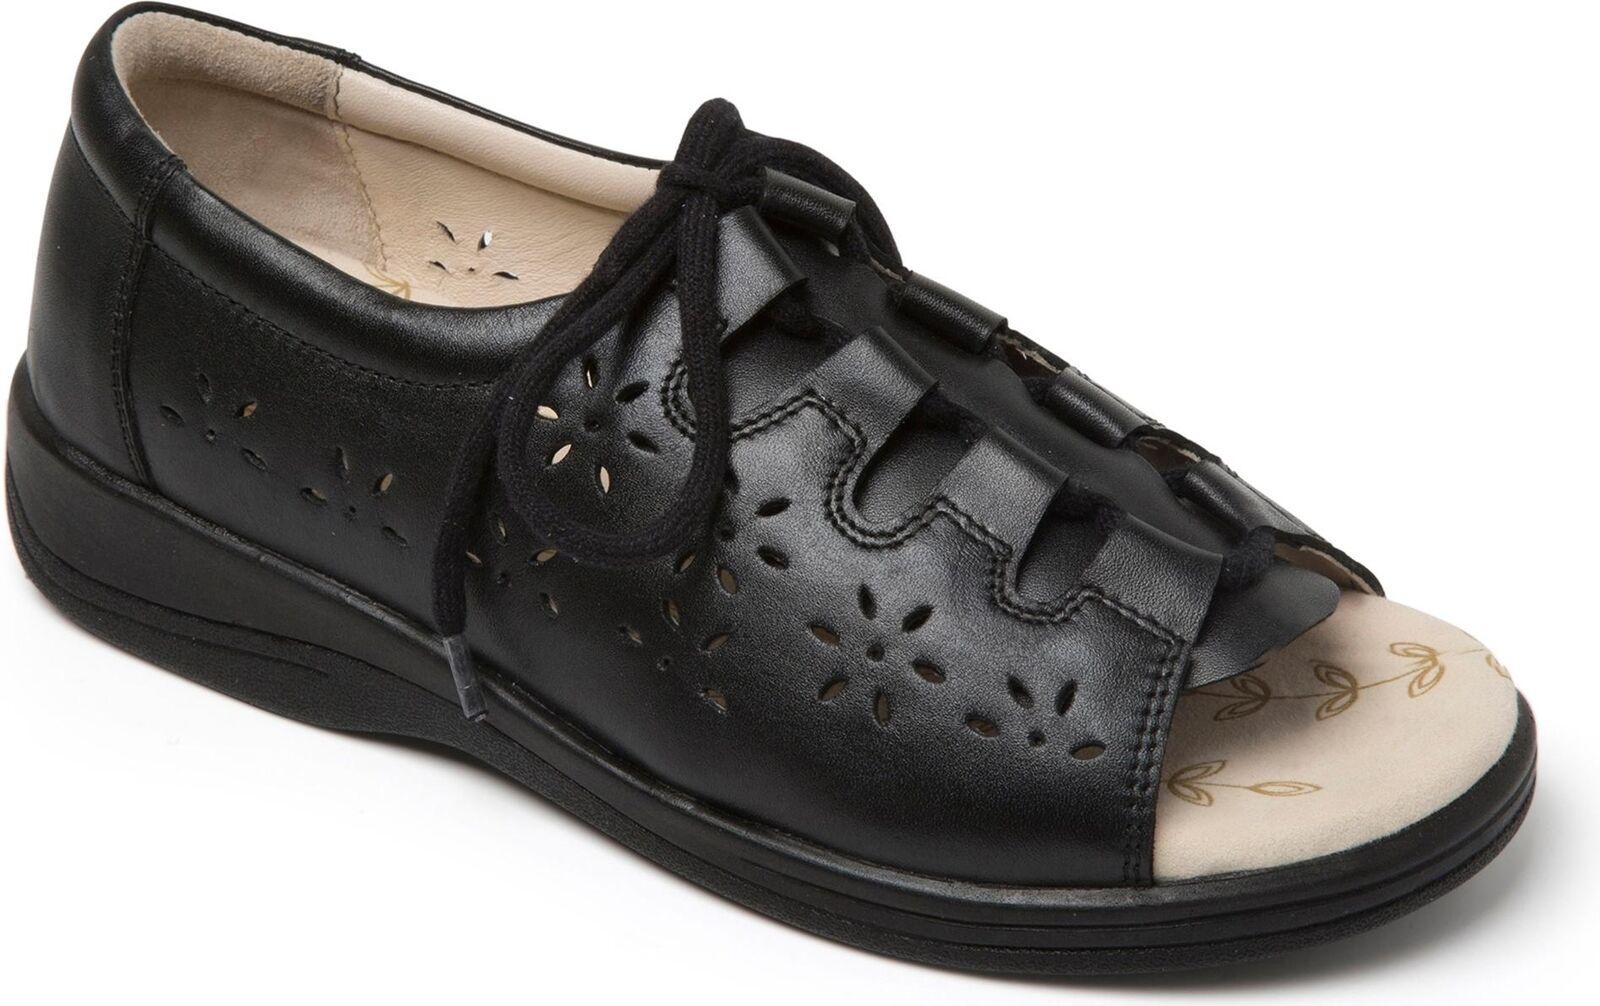 Padders littoral femme en cuir extra large (2E) Sandales Noir